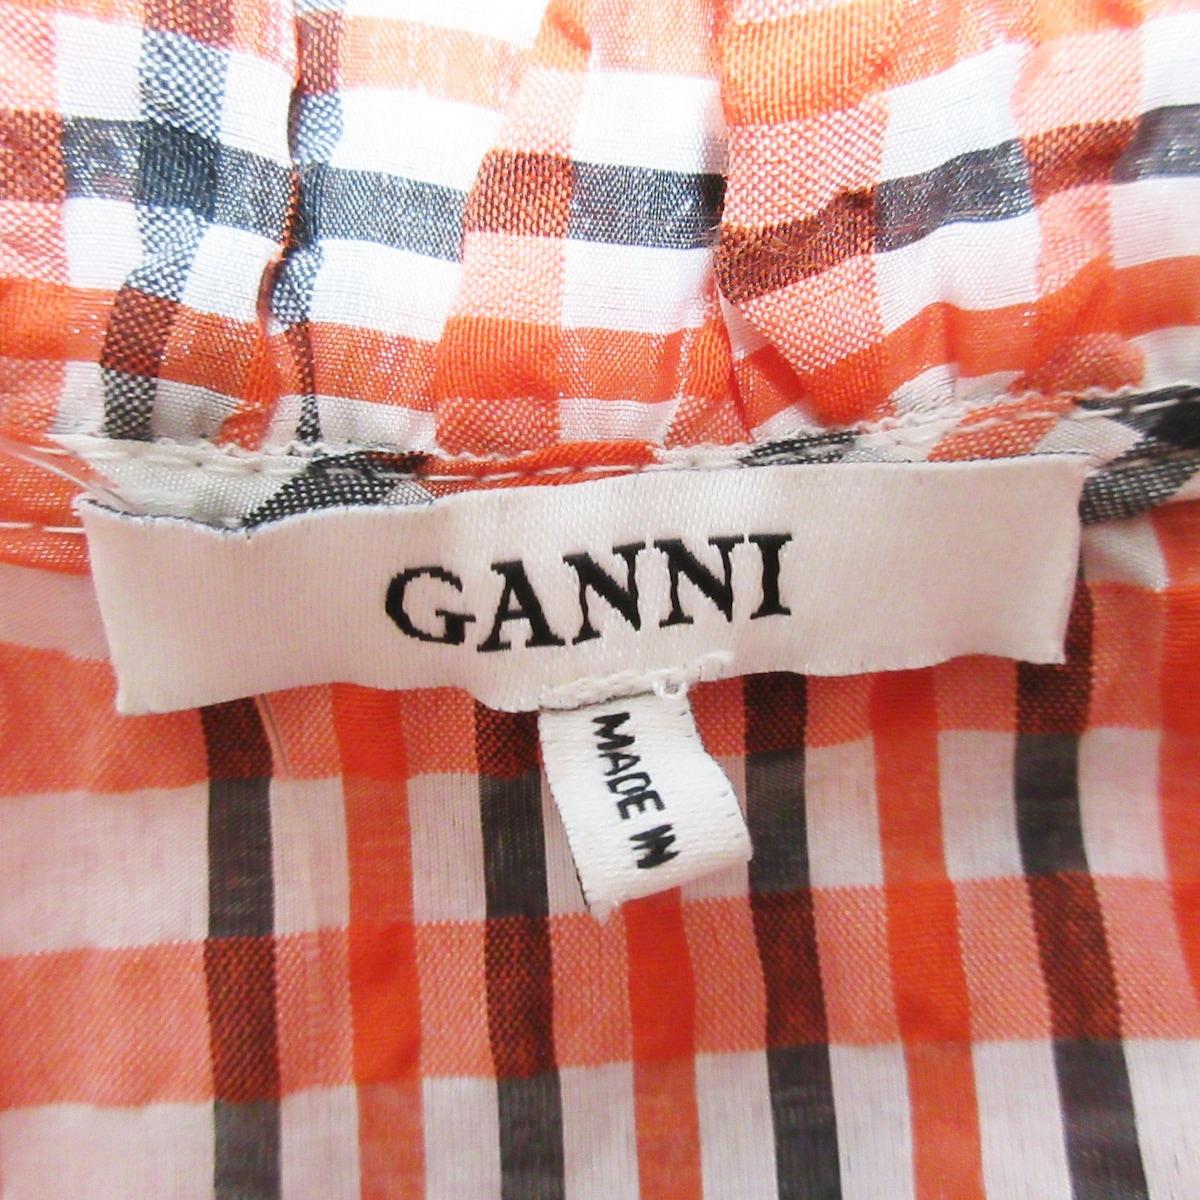 GANNI(ガニー)のワンピース